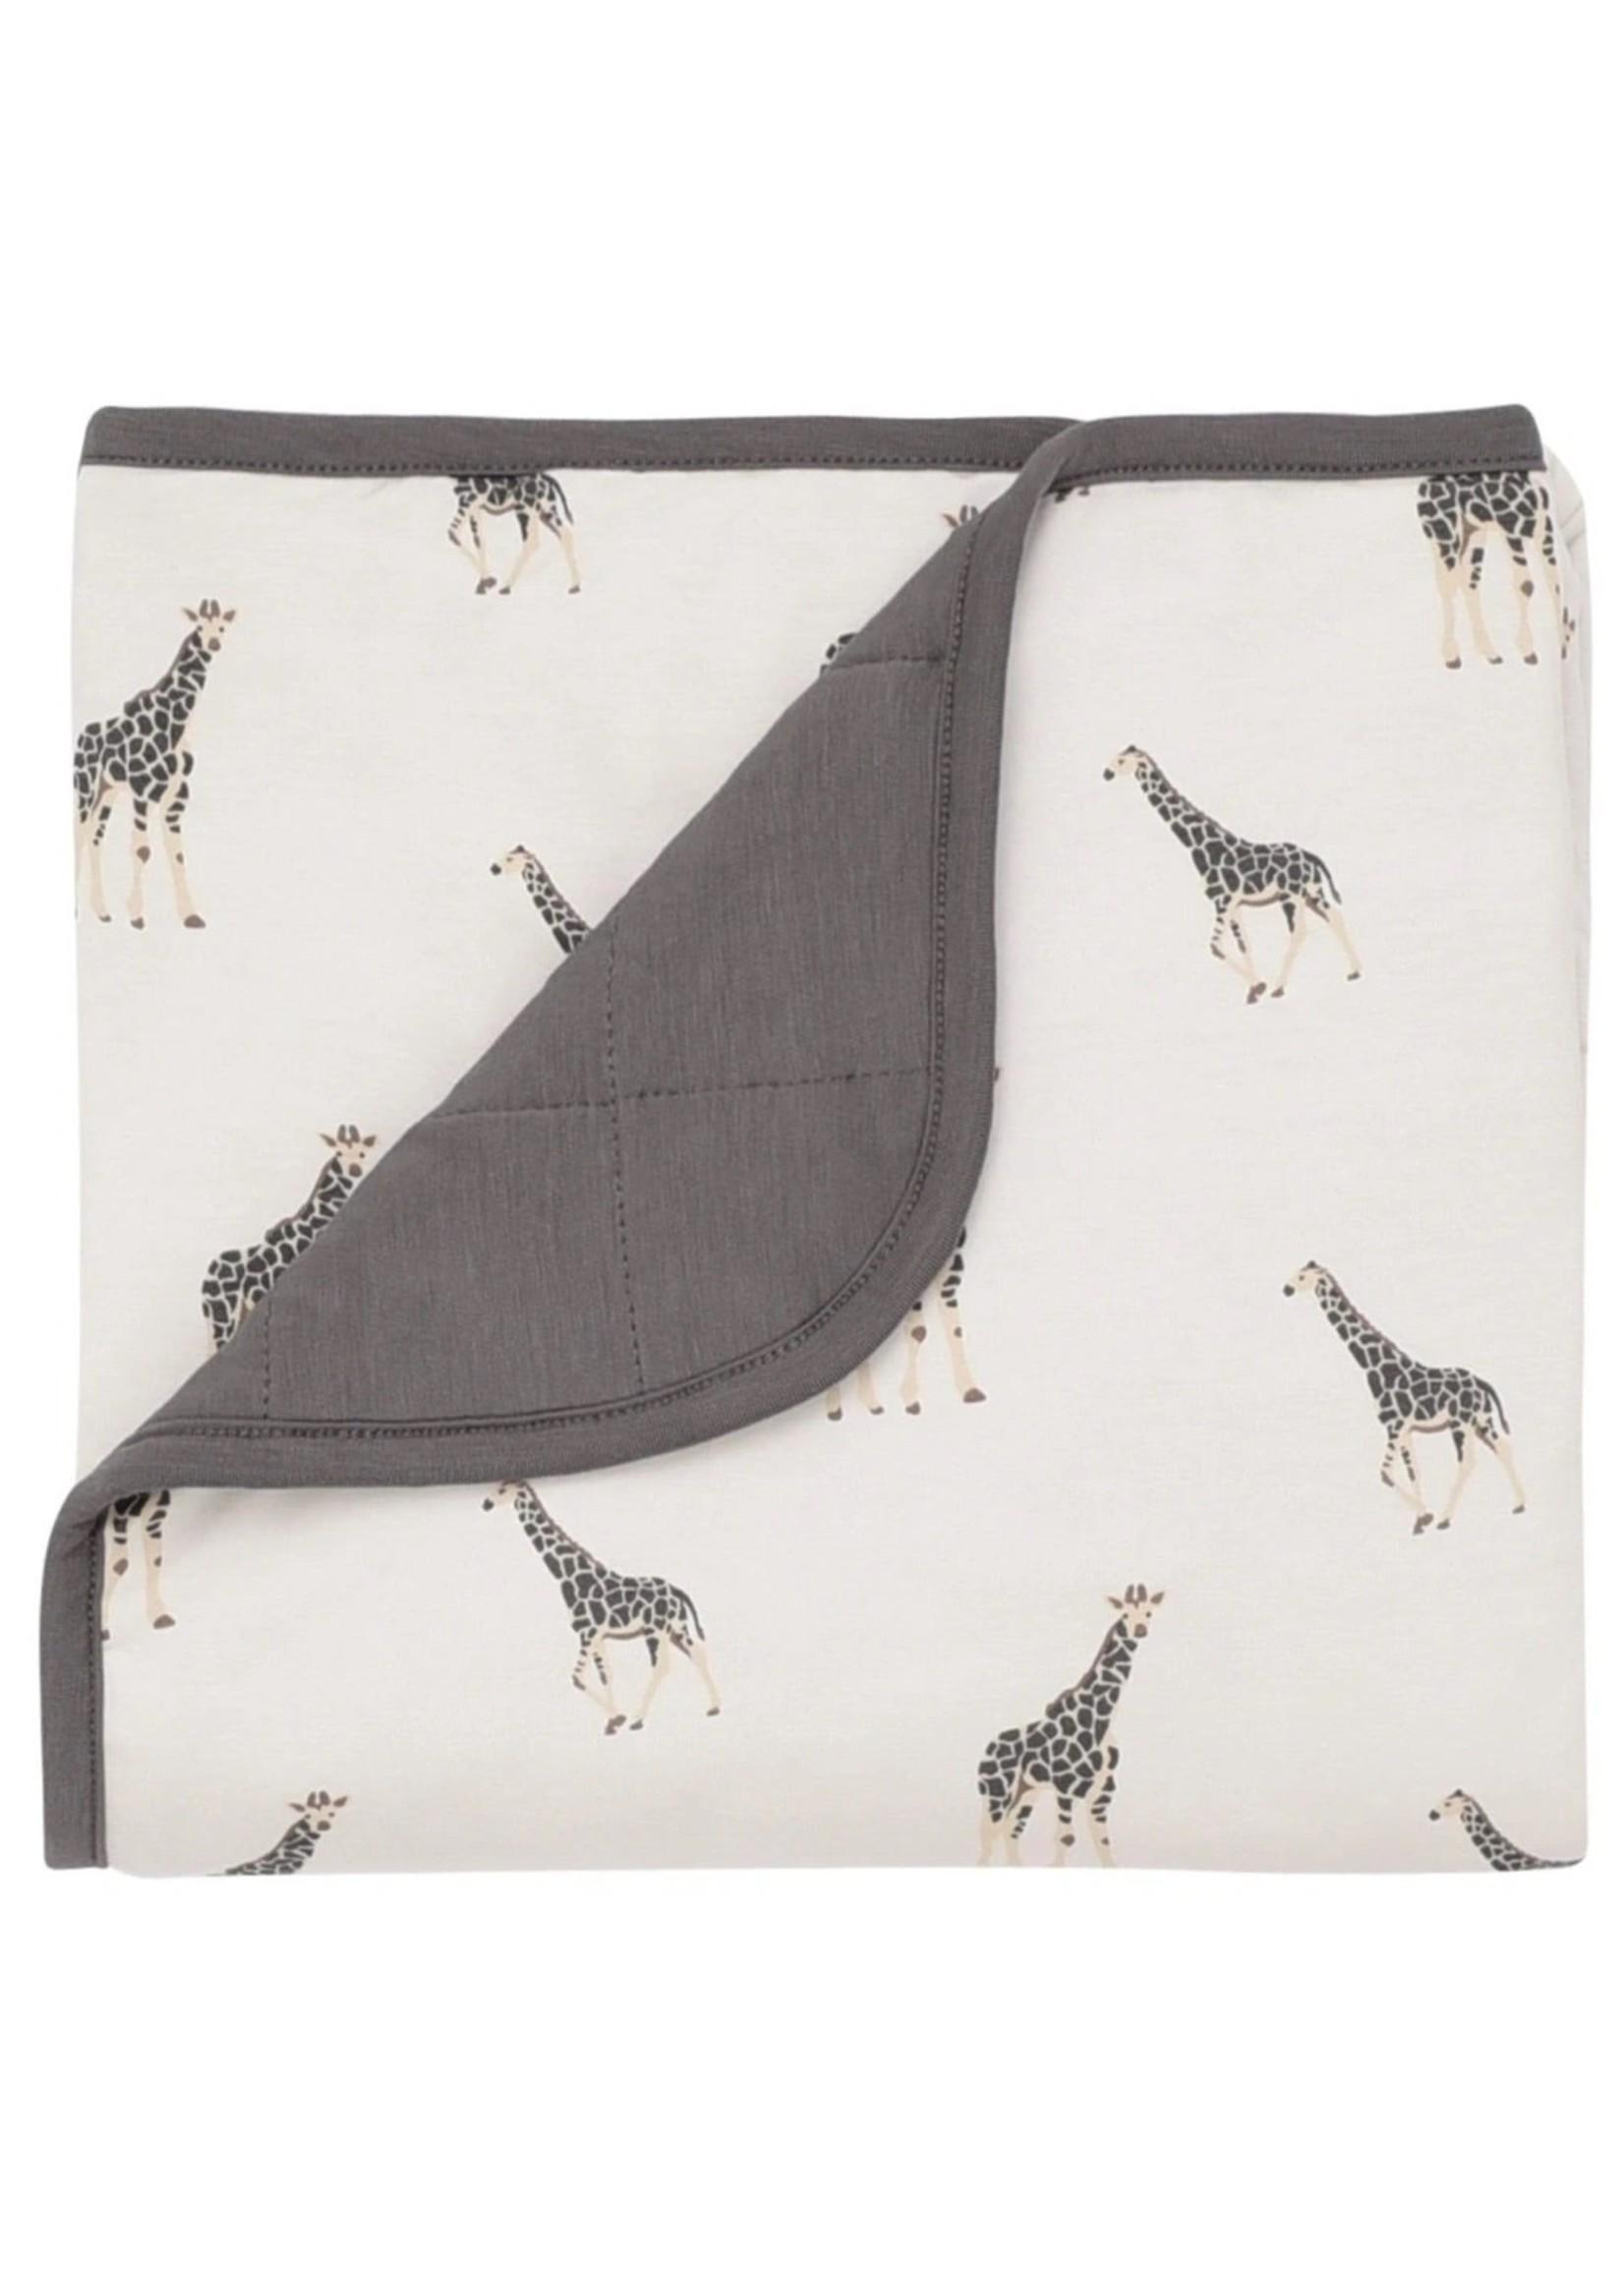 KYTE BABY Printed Baby Blanket GIRAFFE